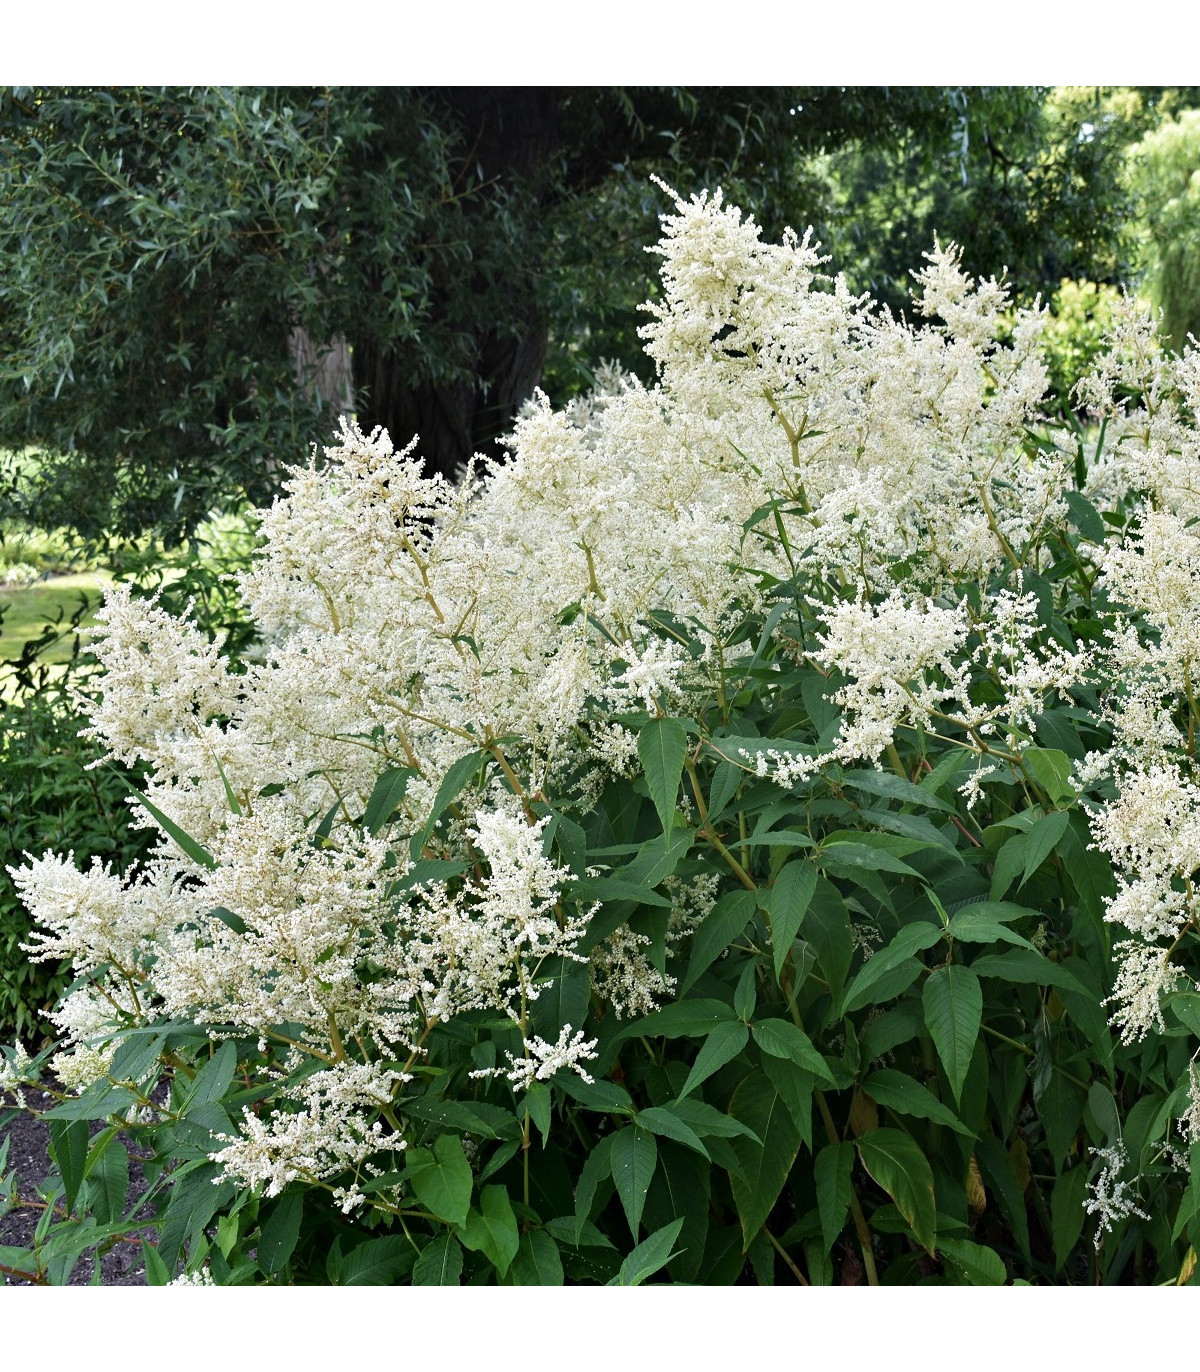 Astilba arendsii biela - Astilbe arendsii - predaj semien - 8 ks